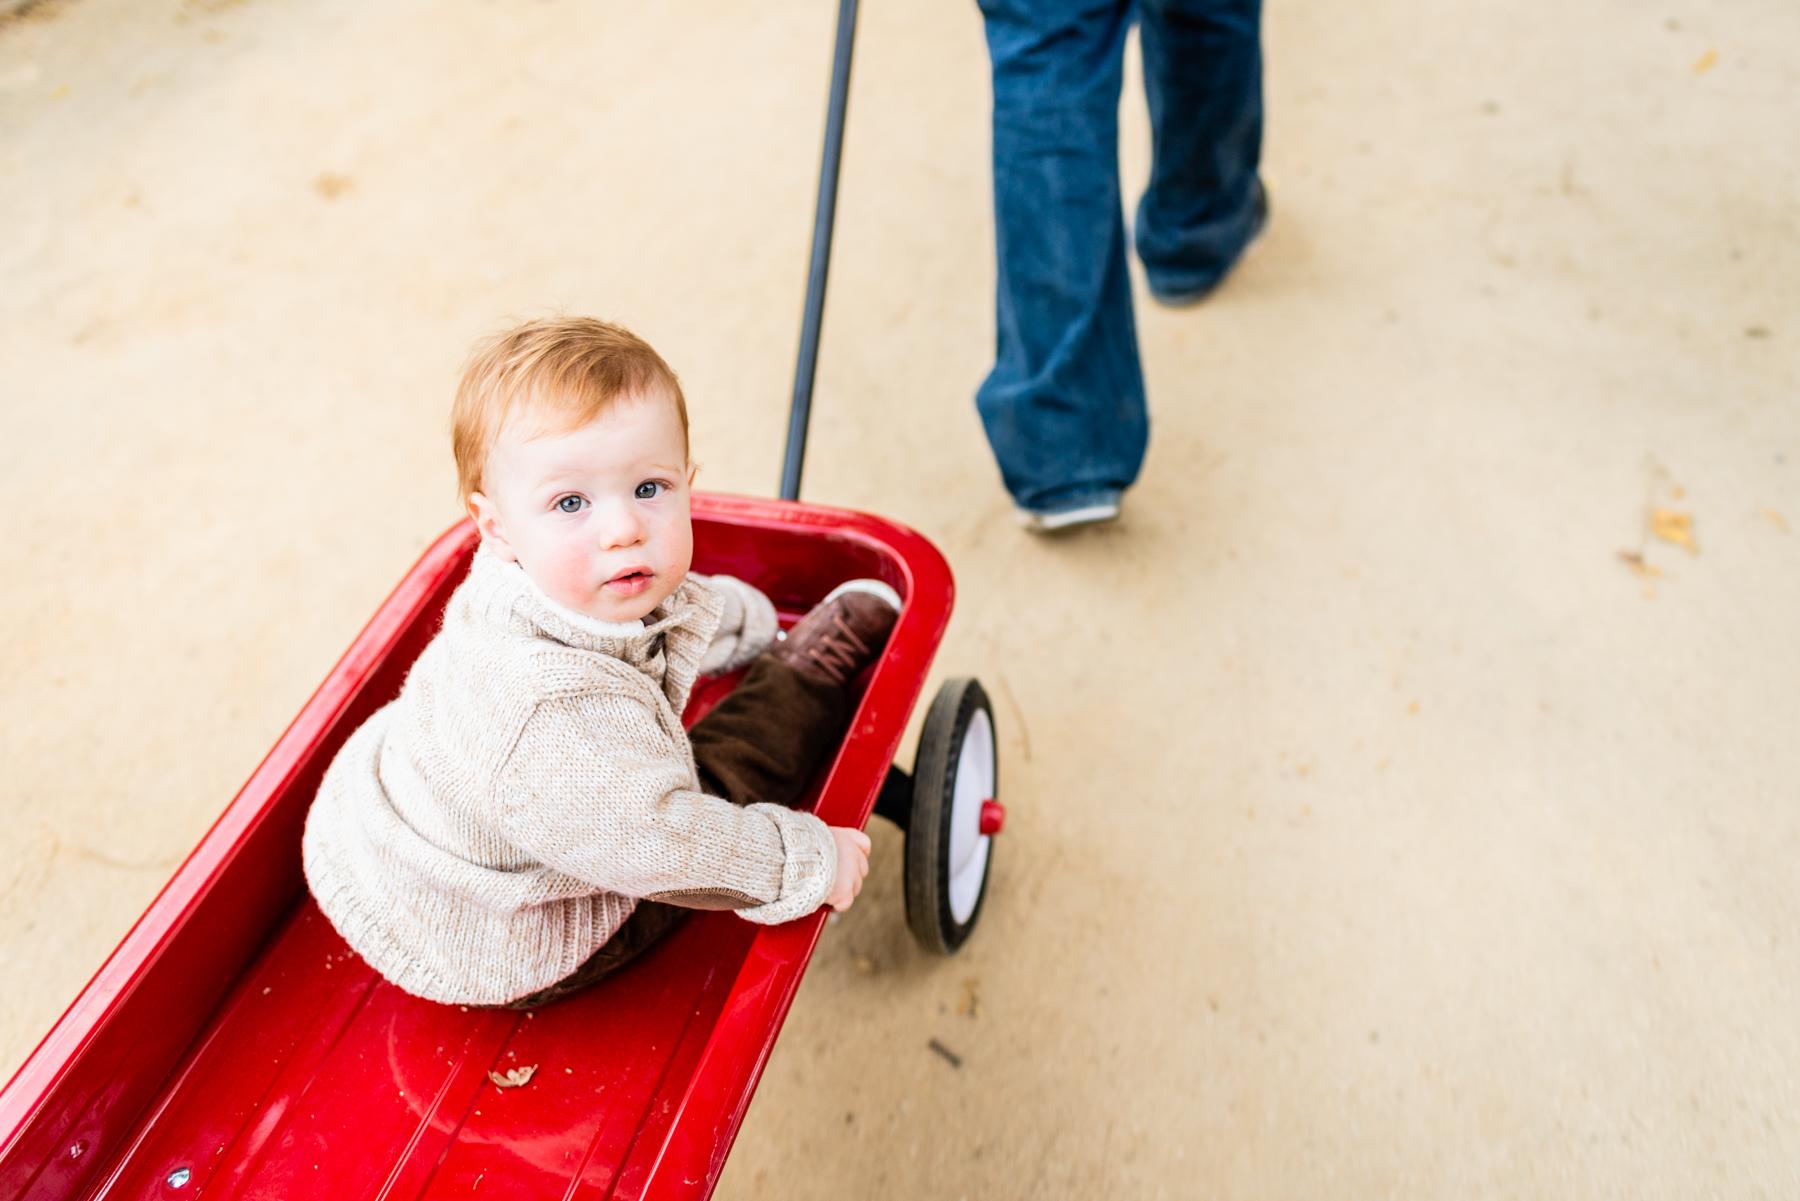 Toddler portrait at Hap Magee Park in Danville, CA.